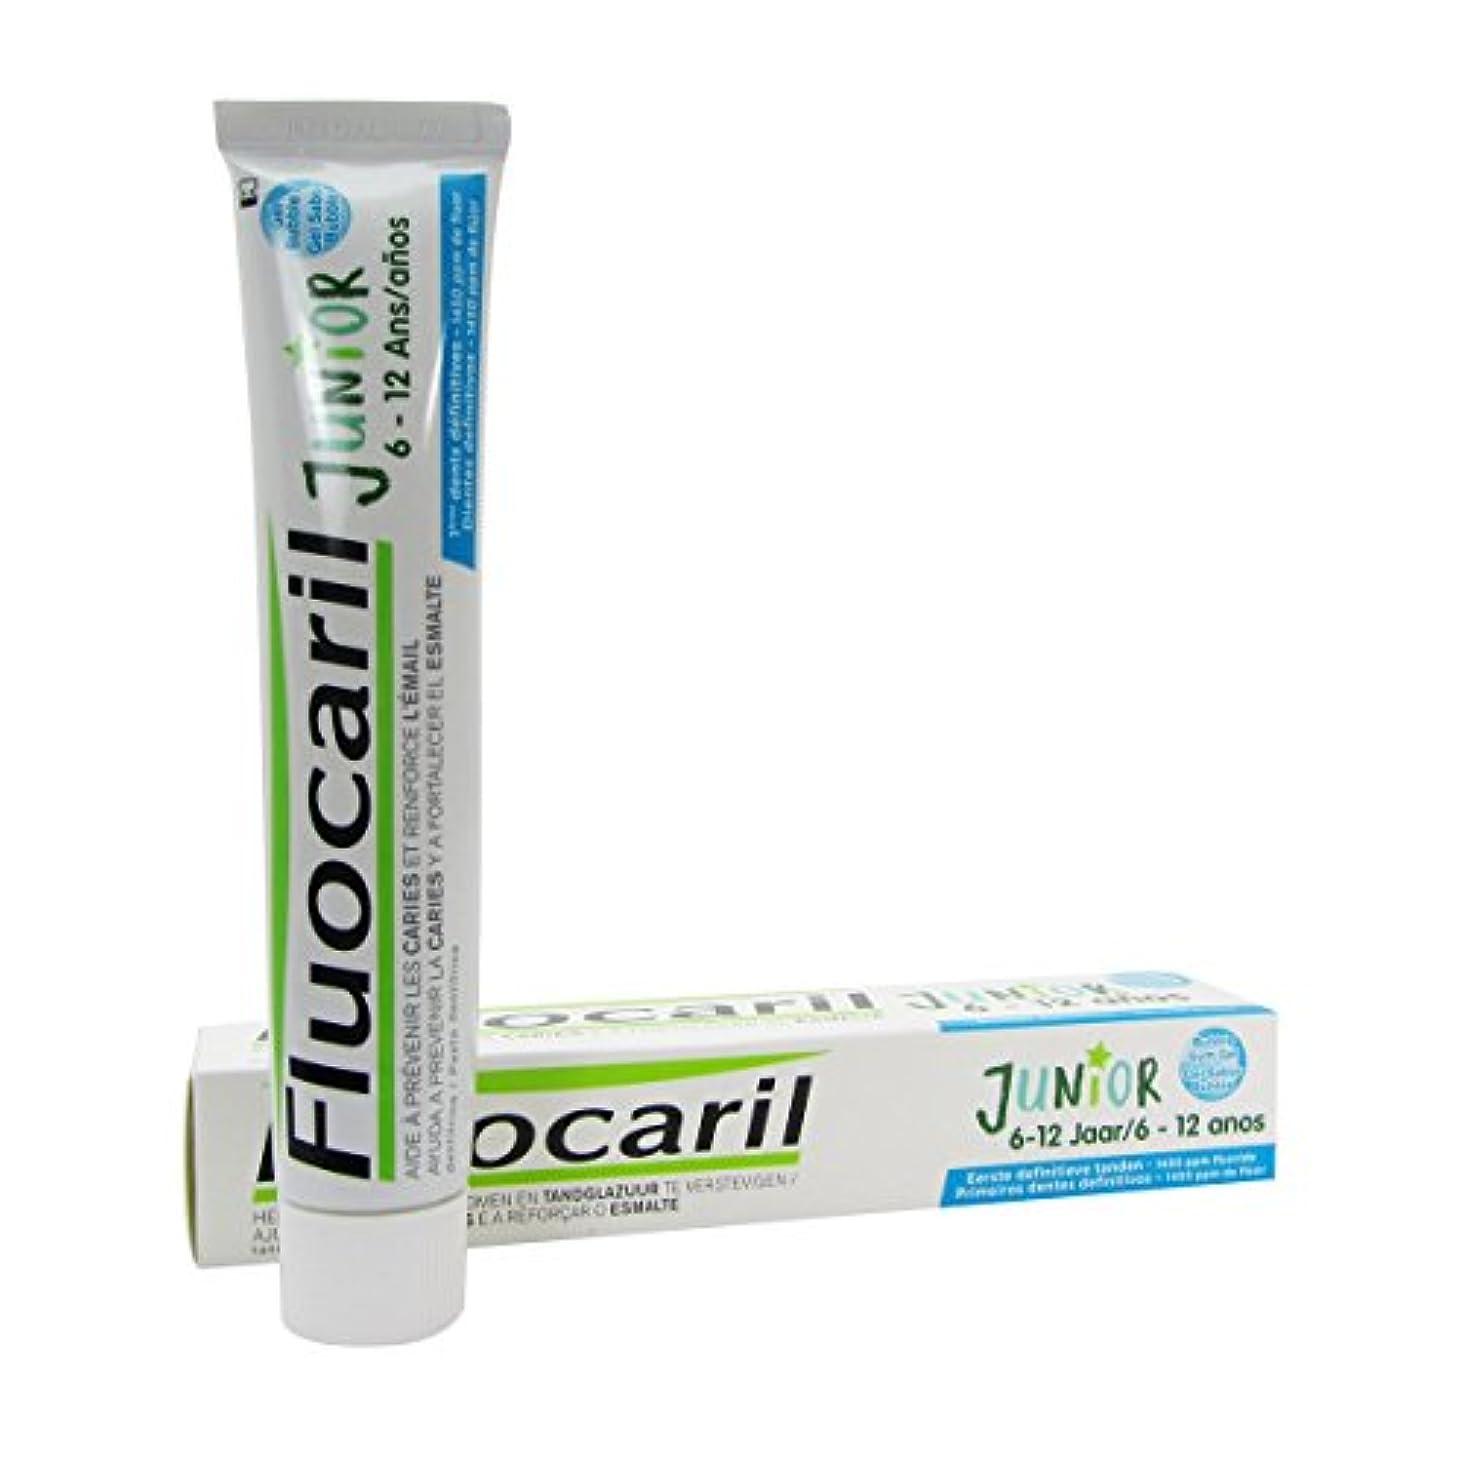 Fluocaril Junior 6 To 12 Bubble Dentifrice Gel 75ml [並行輸入品]